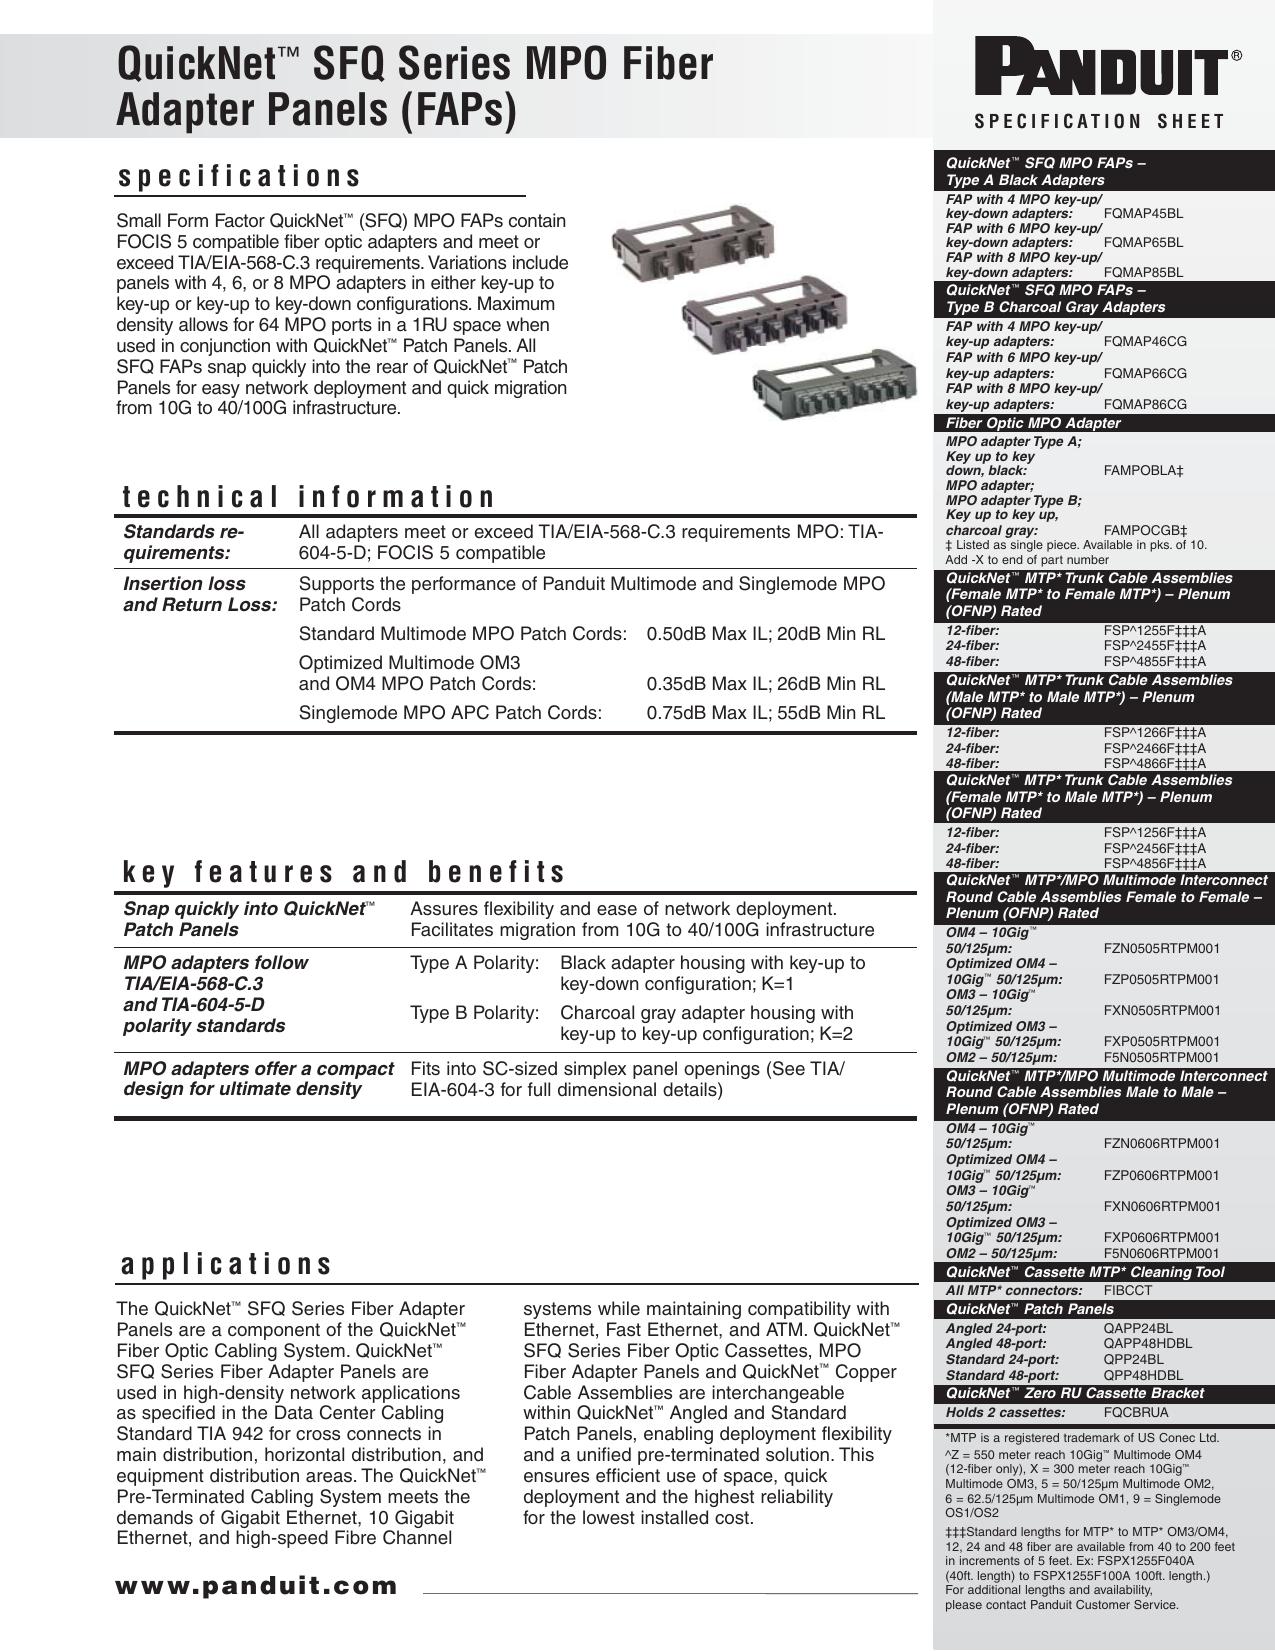 QuickNet™ SFQ Series MPO Fiber Adapter Panels (FAPs